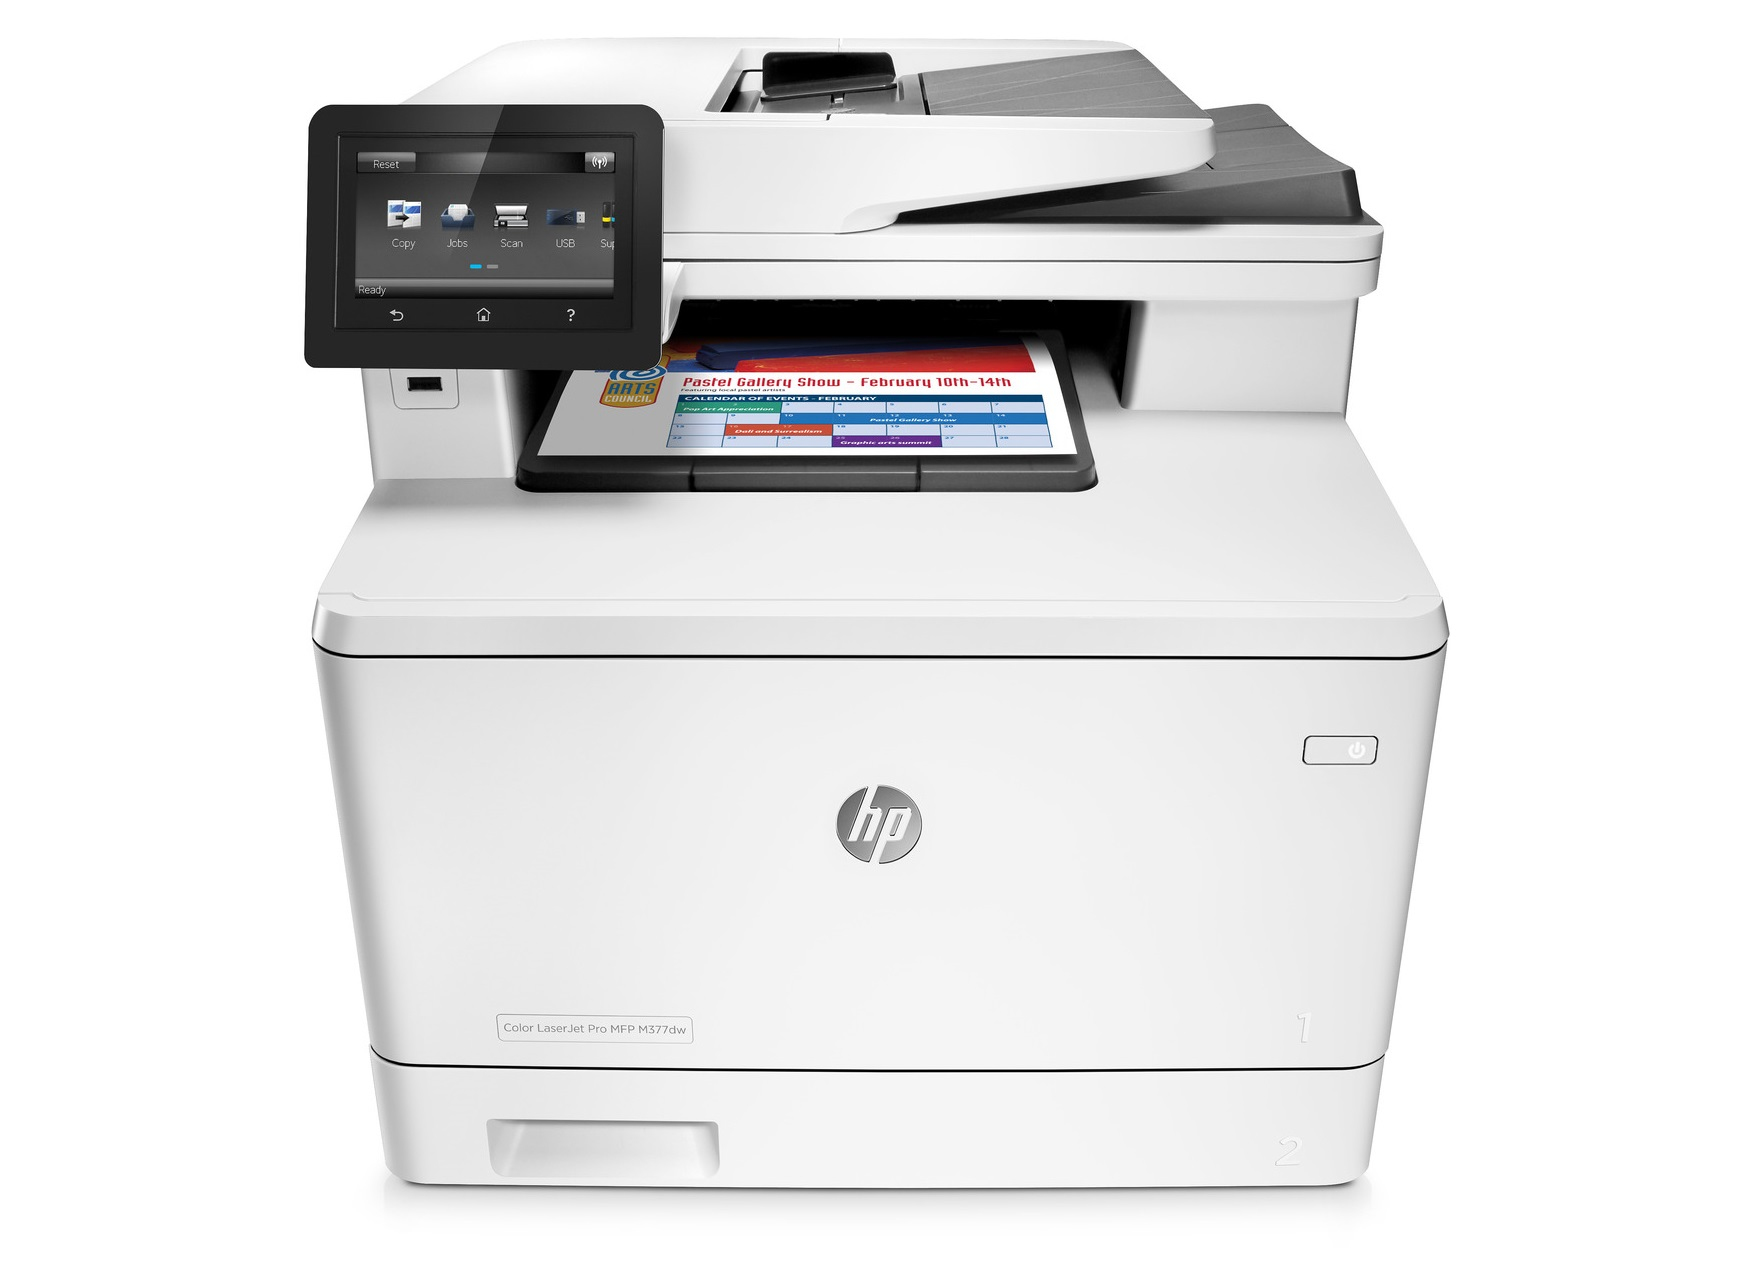 HP LaserJet Pro MFP M377dw Laser A4 Wi-Fi Grey